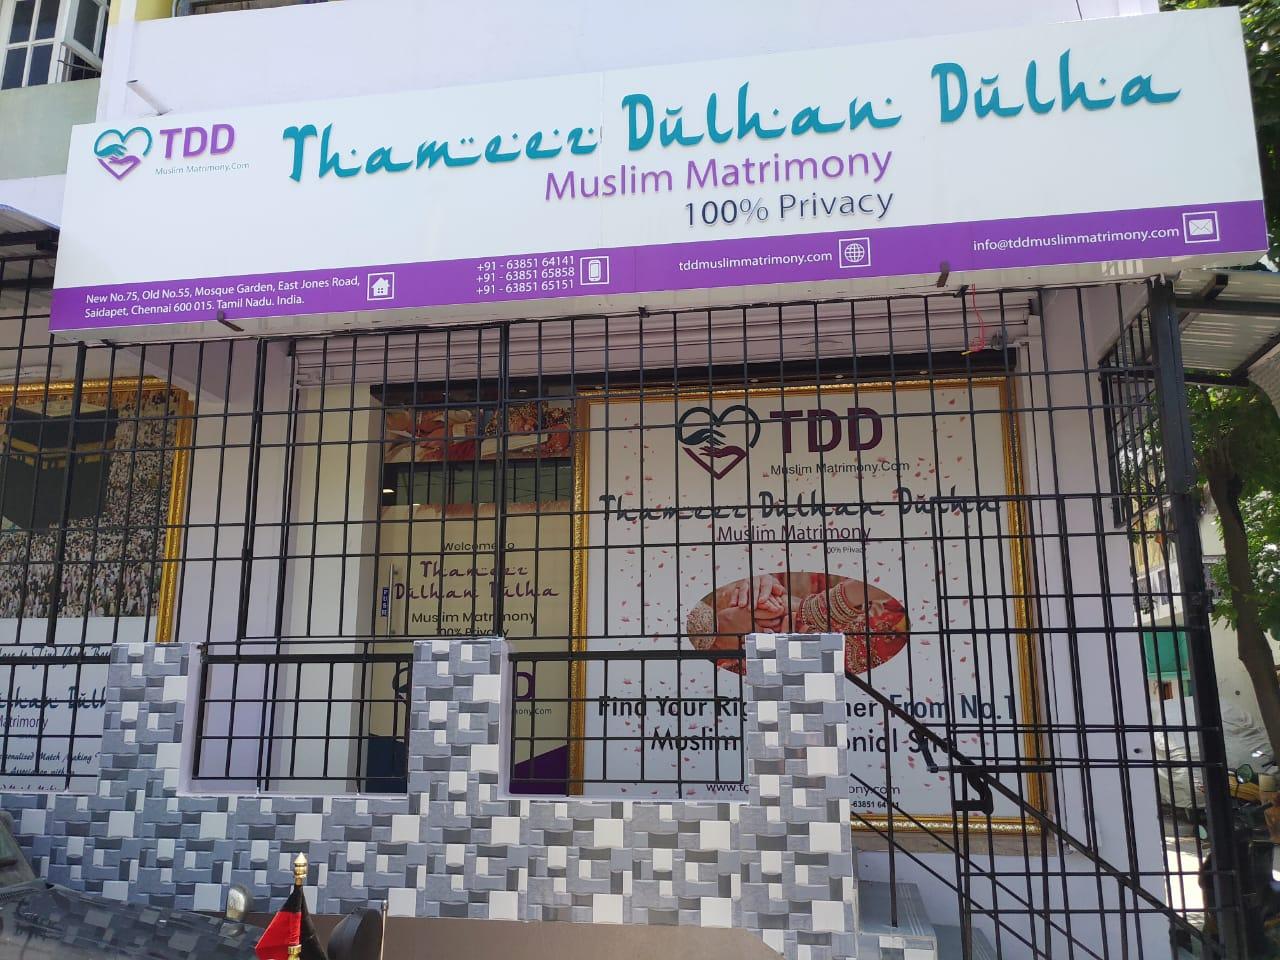 Thameez Dulhan Dulha Muslim Matrimony in Saidapet, Chennai-600015